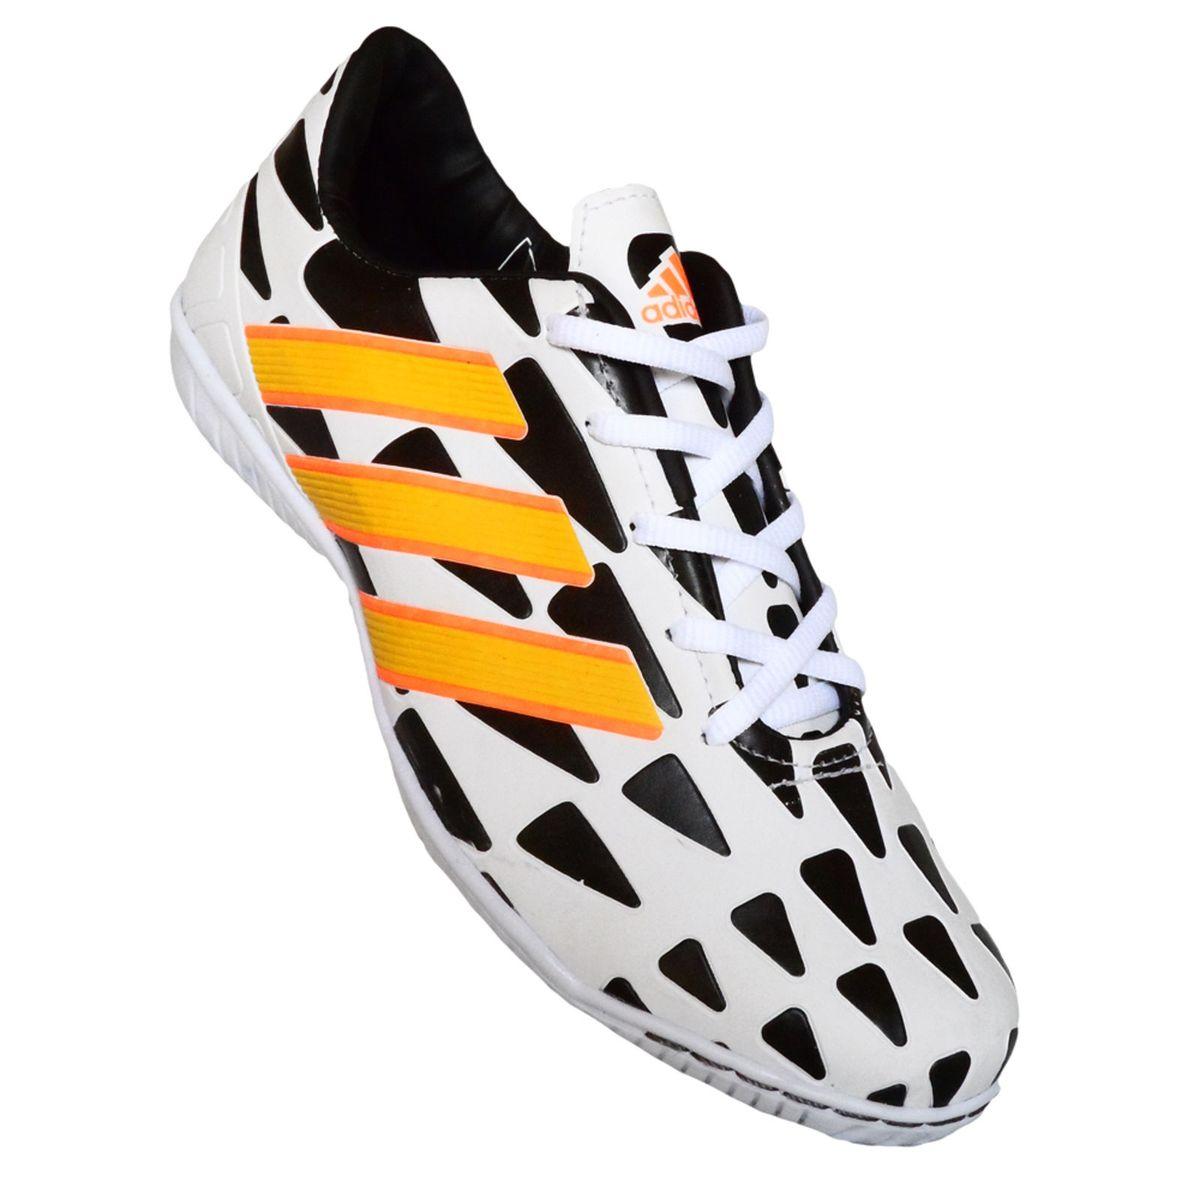 chuteira society adidas nitrocharge 3 - tênis adidas ae5377754beff